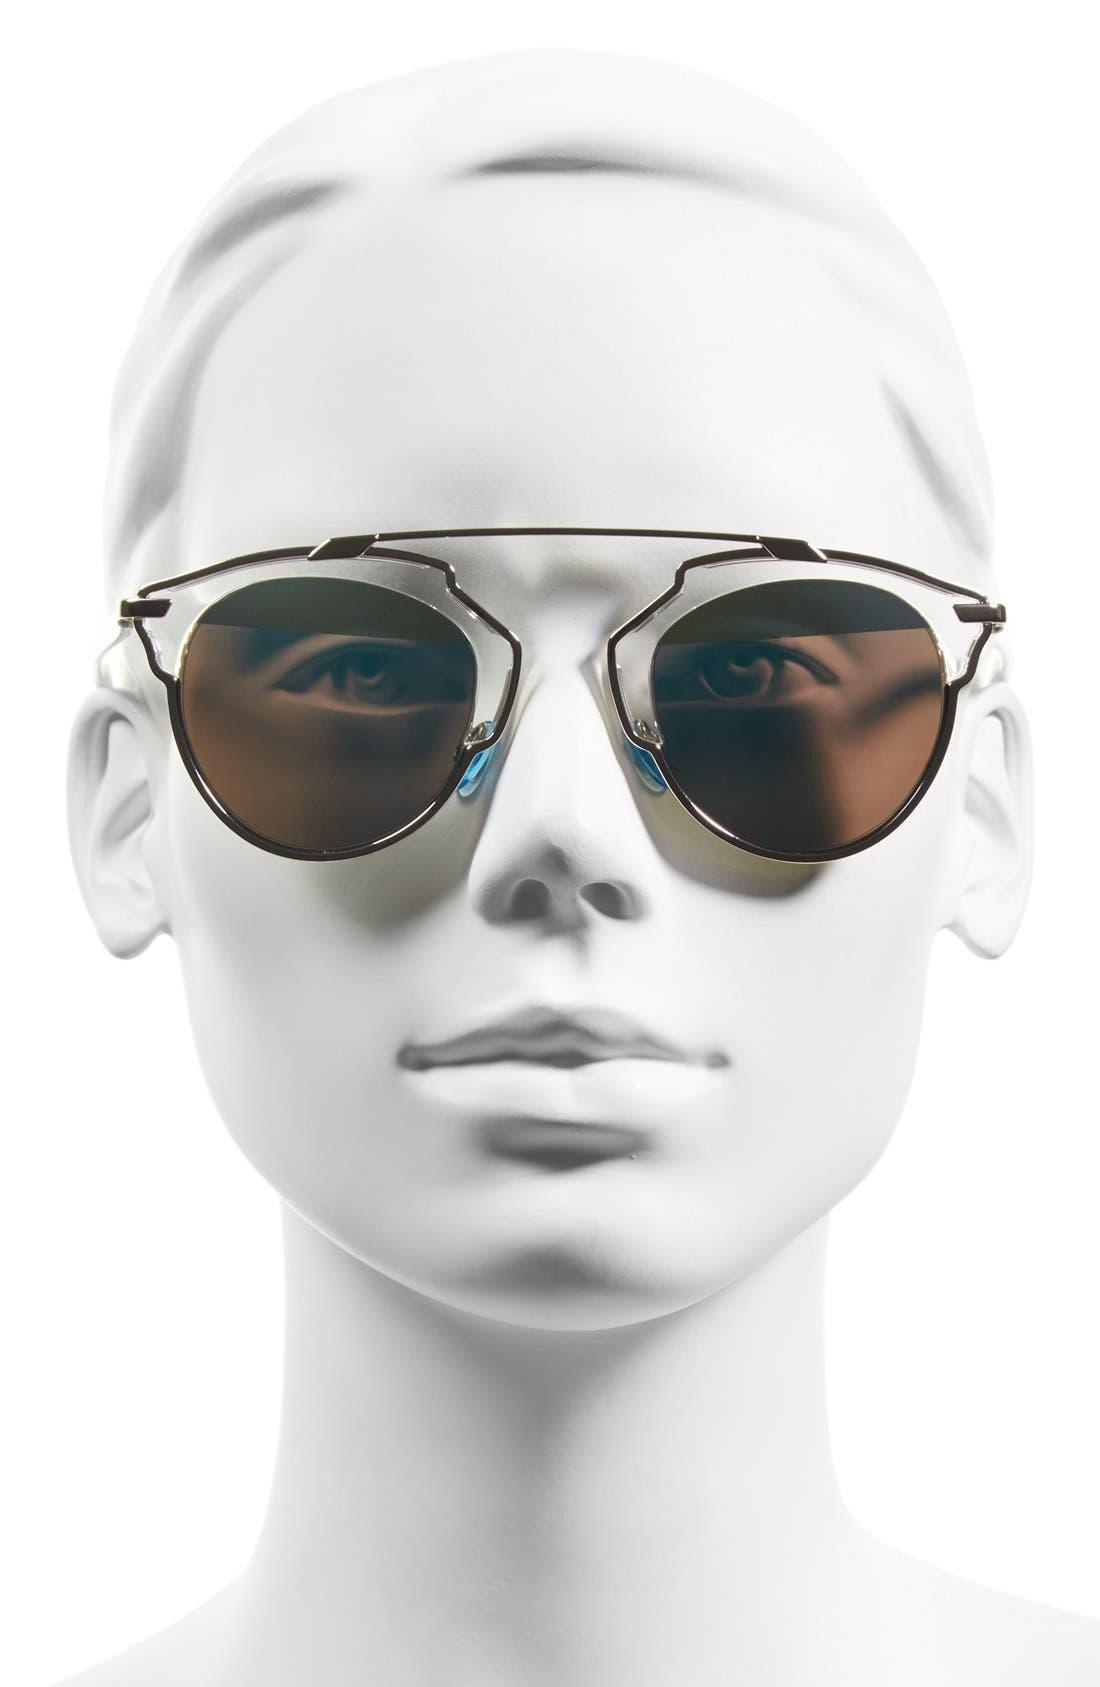 So Real 48mm Brow Bar Sunglasses,                             Alternate thumbnail 38, color,